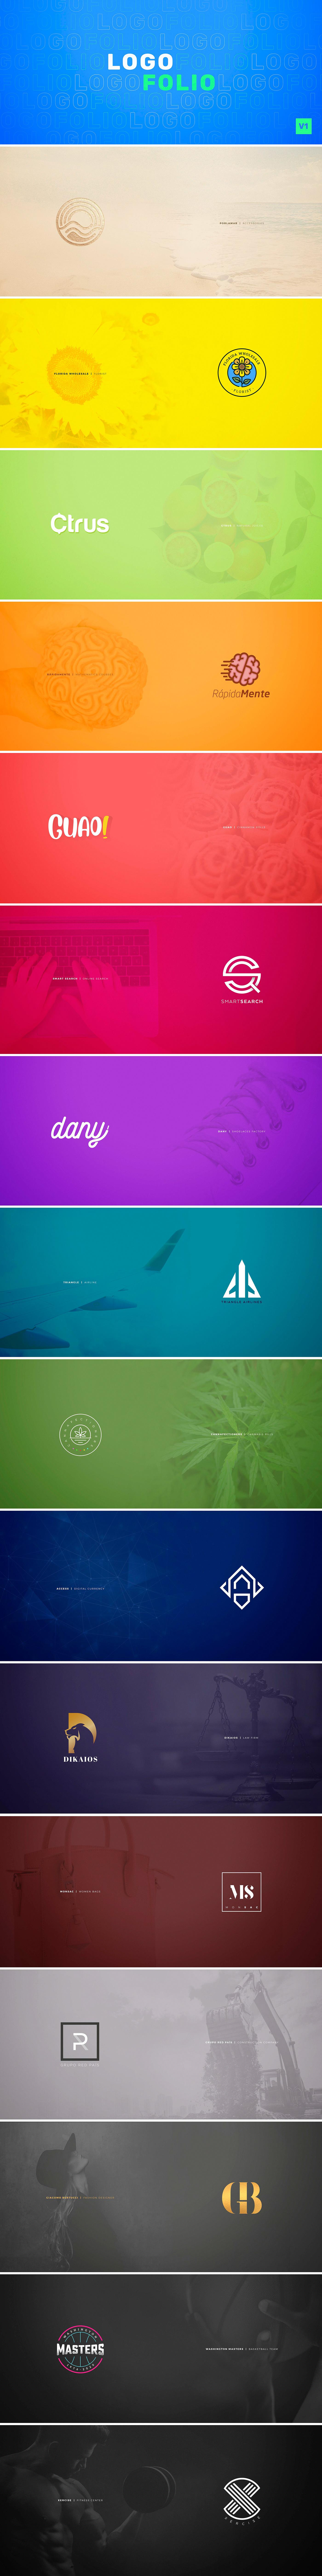 brand design designer font graphic design  Illustrator logo logofolio Logotipo minimal